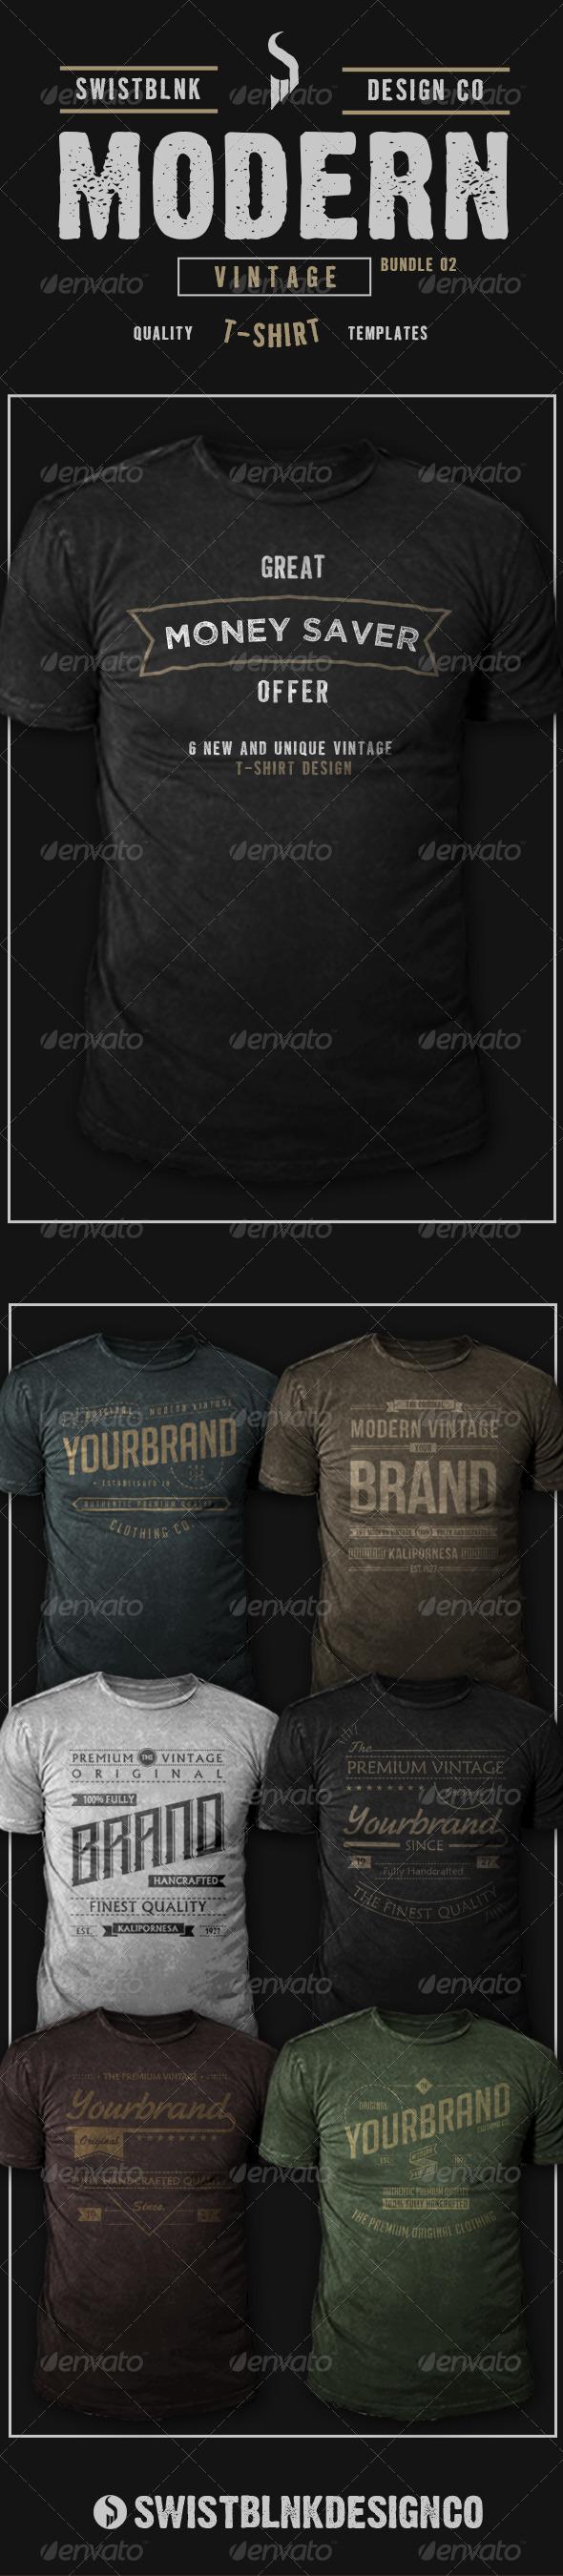 Modern Vintage T-Shirt Bundle 02 - Designs T-Shirts